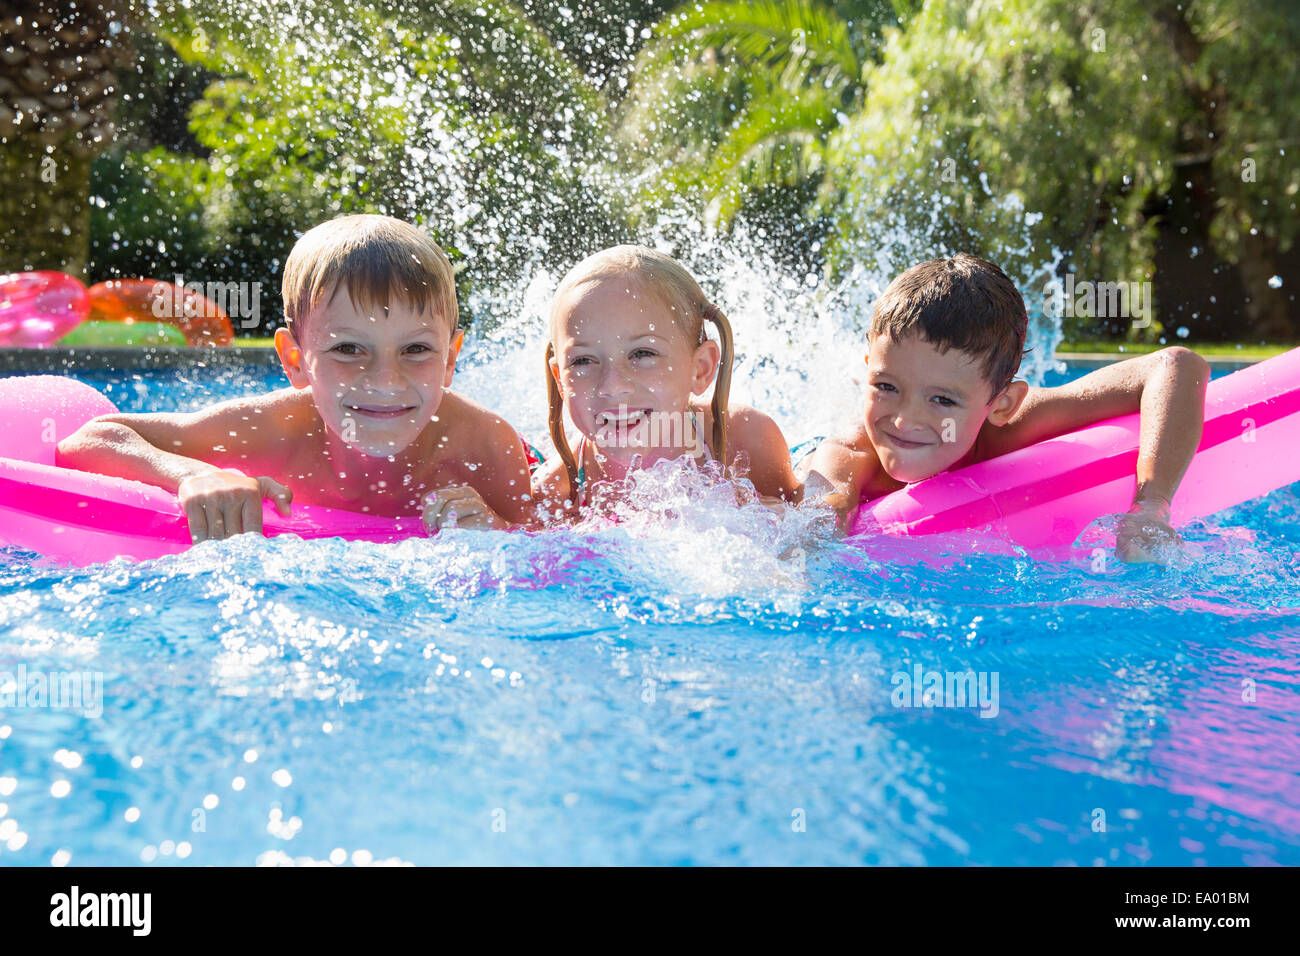 Portrait of three children splashing on inflatable mattress in garden swimming pool - Stock Image